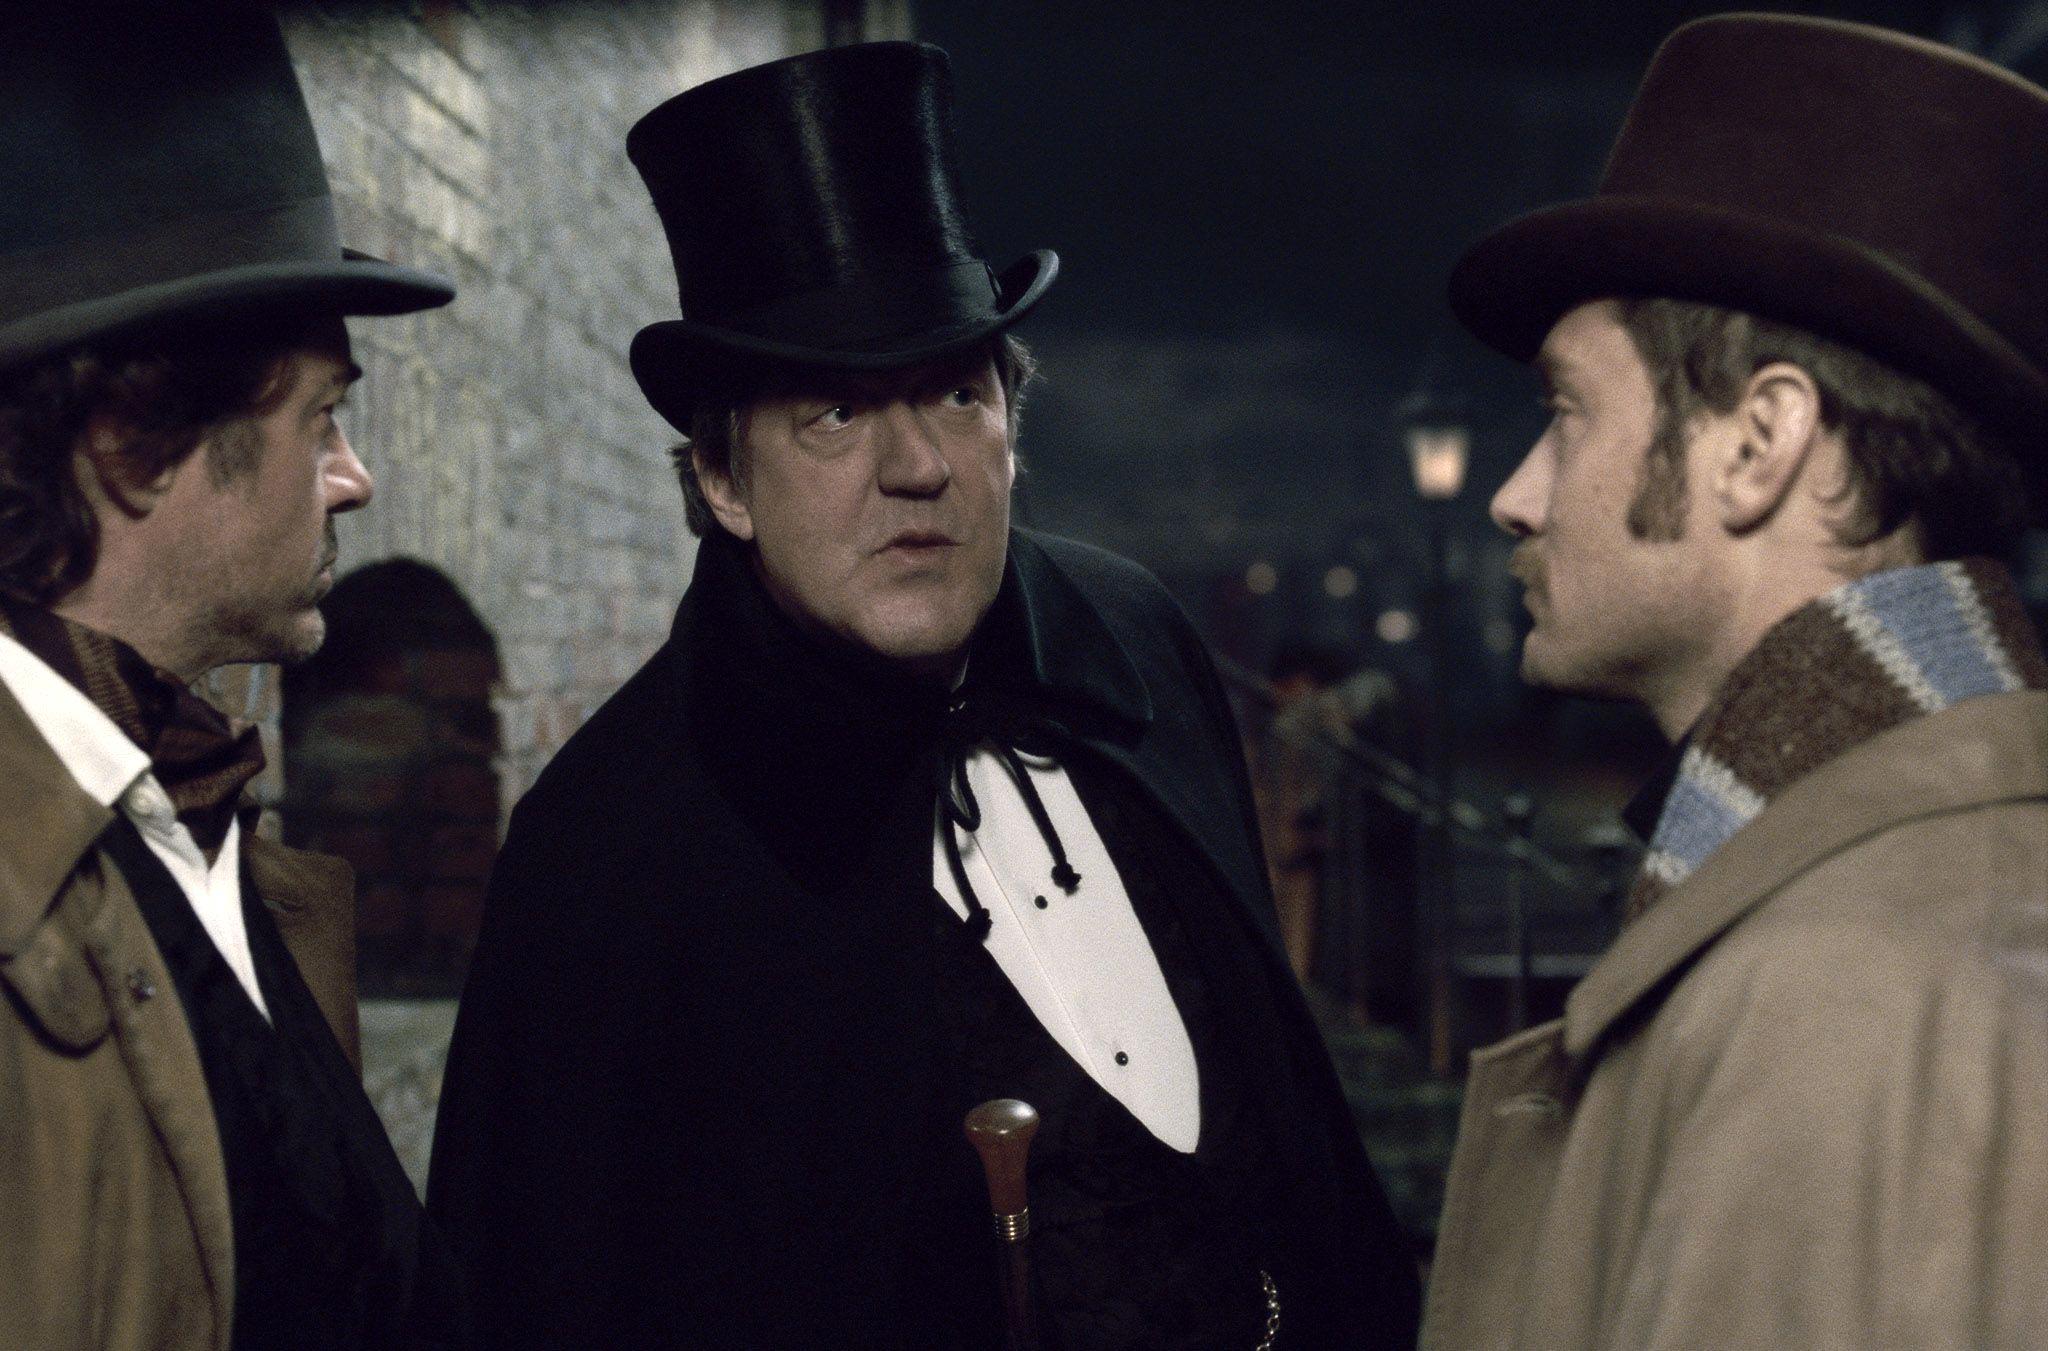 https://i2.wp.com/www.filmofilia.com/wp-content/uploads/2011/12/SHERLOCK-HOLMES_2_25.jpg